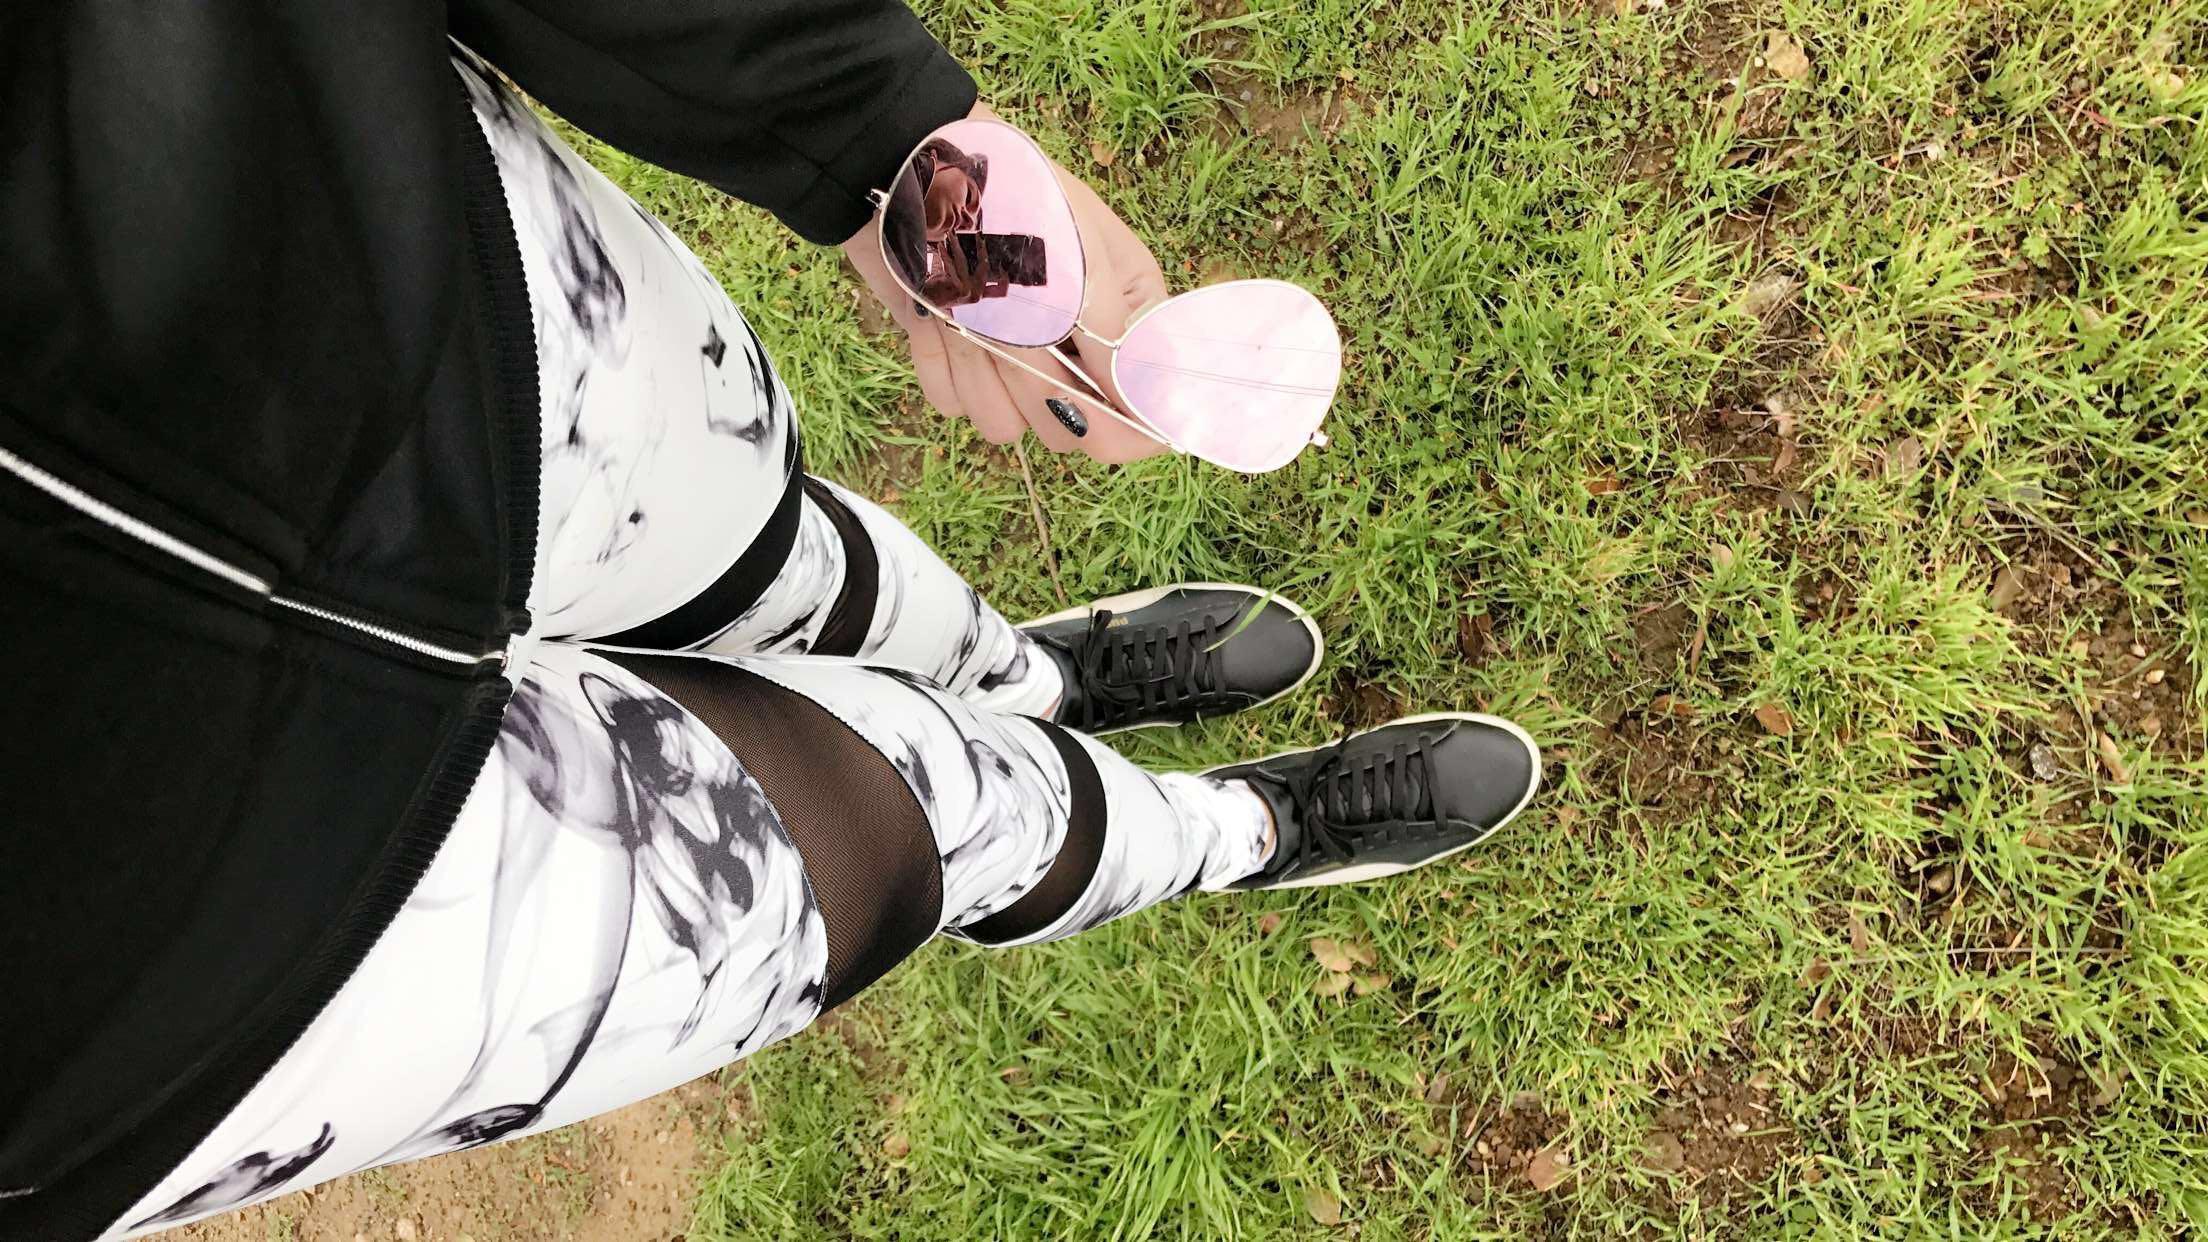 RoseWholeSale Marble Print Yoga Pants